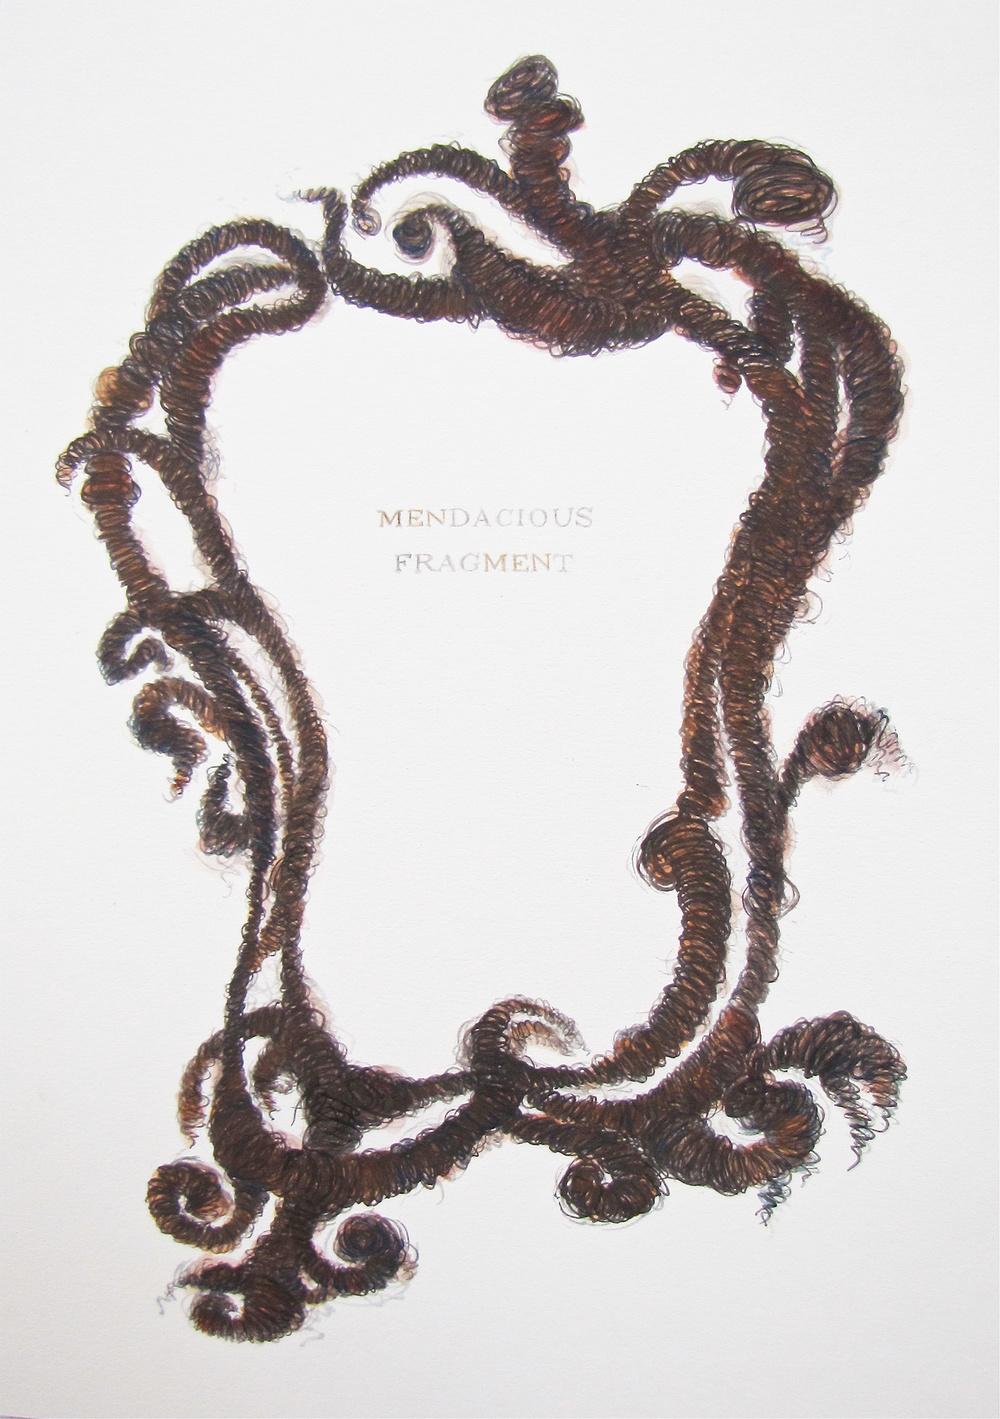 Mendacious fragment 2011